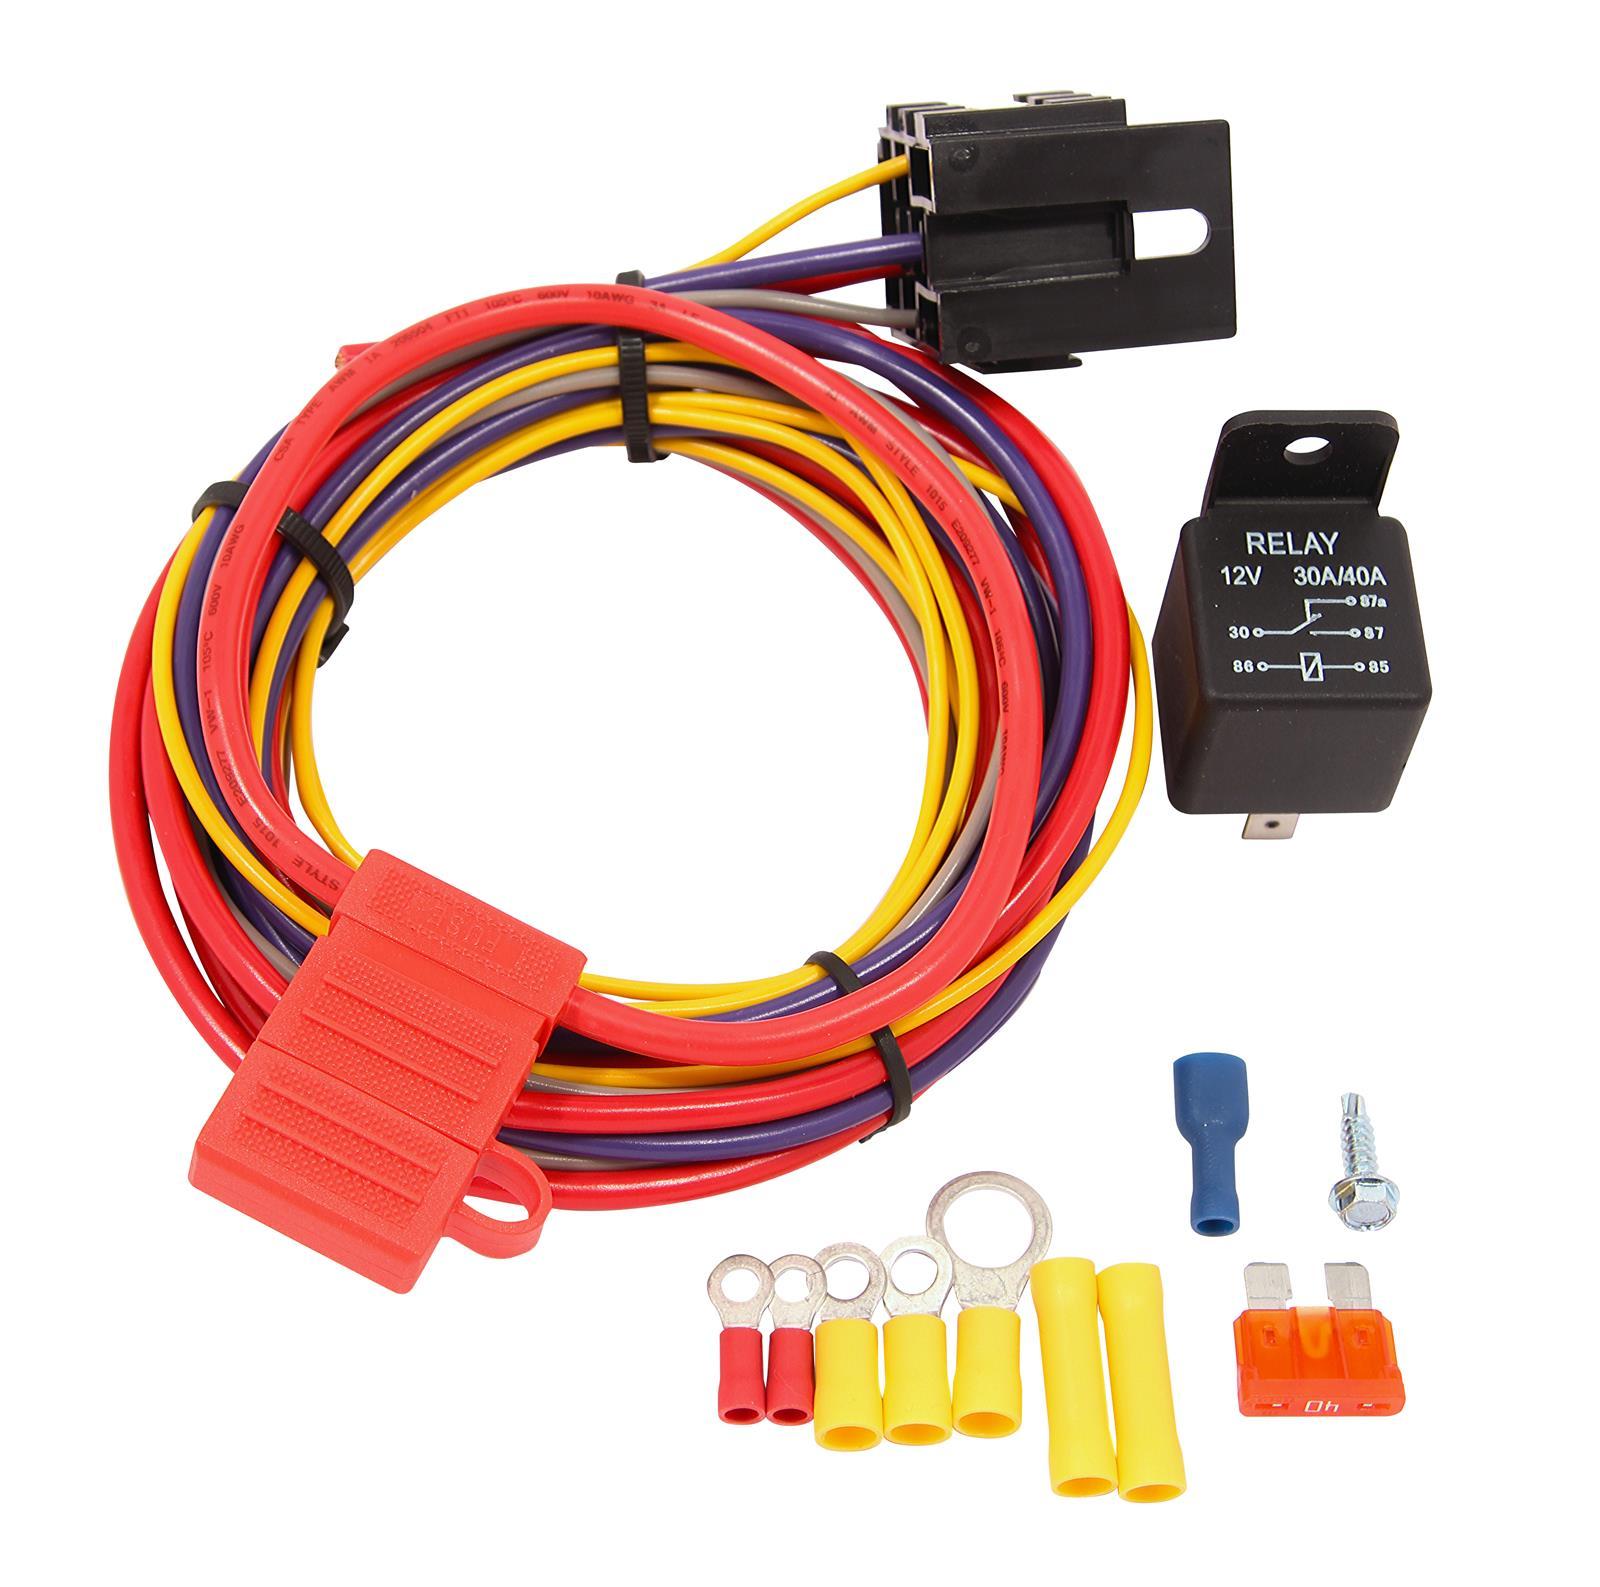 quick fuel fuel pump wiring kits 30 199qft free shipping. Black Bedroom Furniture Sets. Home Design Ideas